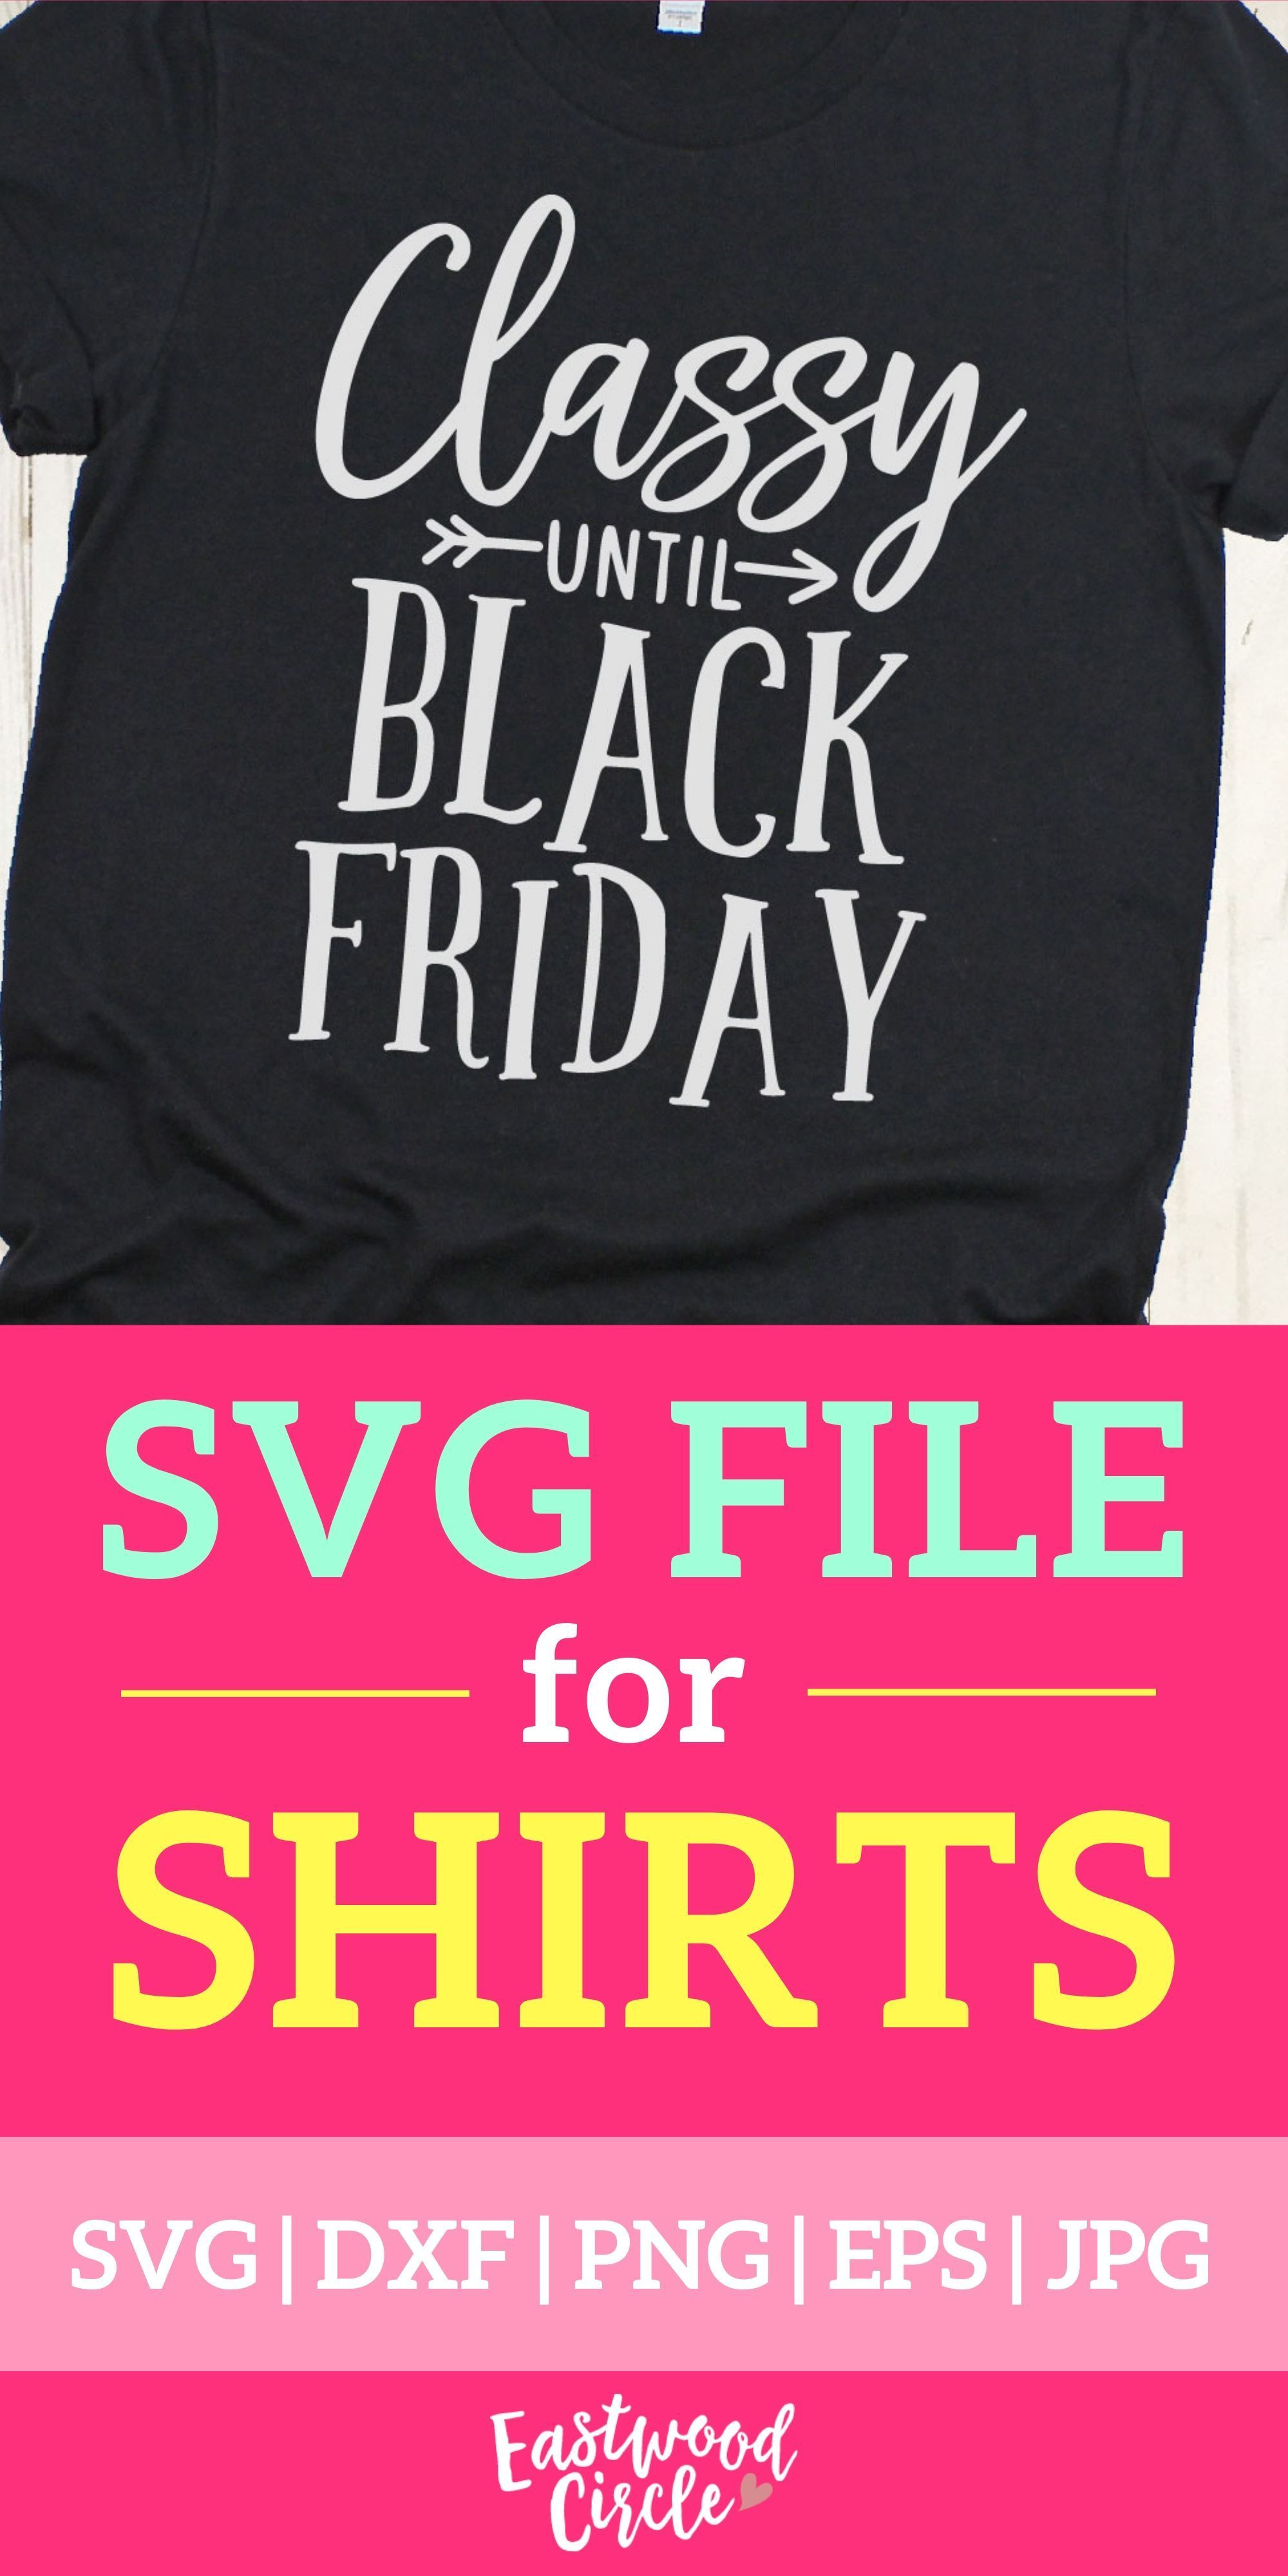 Classy Until Black Friday Svg Black Friday Svg Thanksgiving Etsy In 2020 Black Friday Shirts Friday Shirts Black Friday